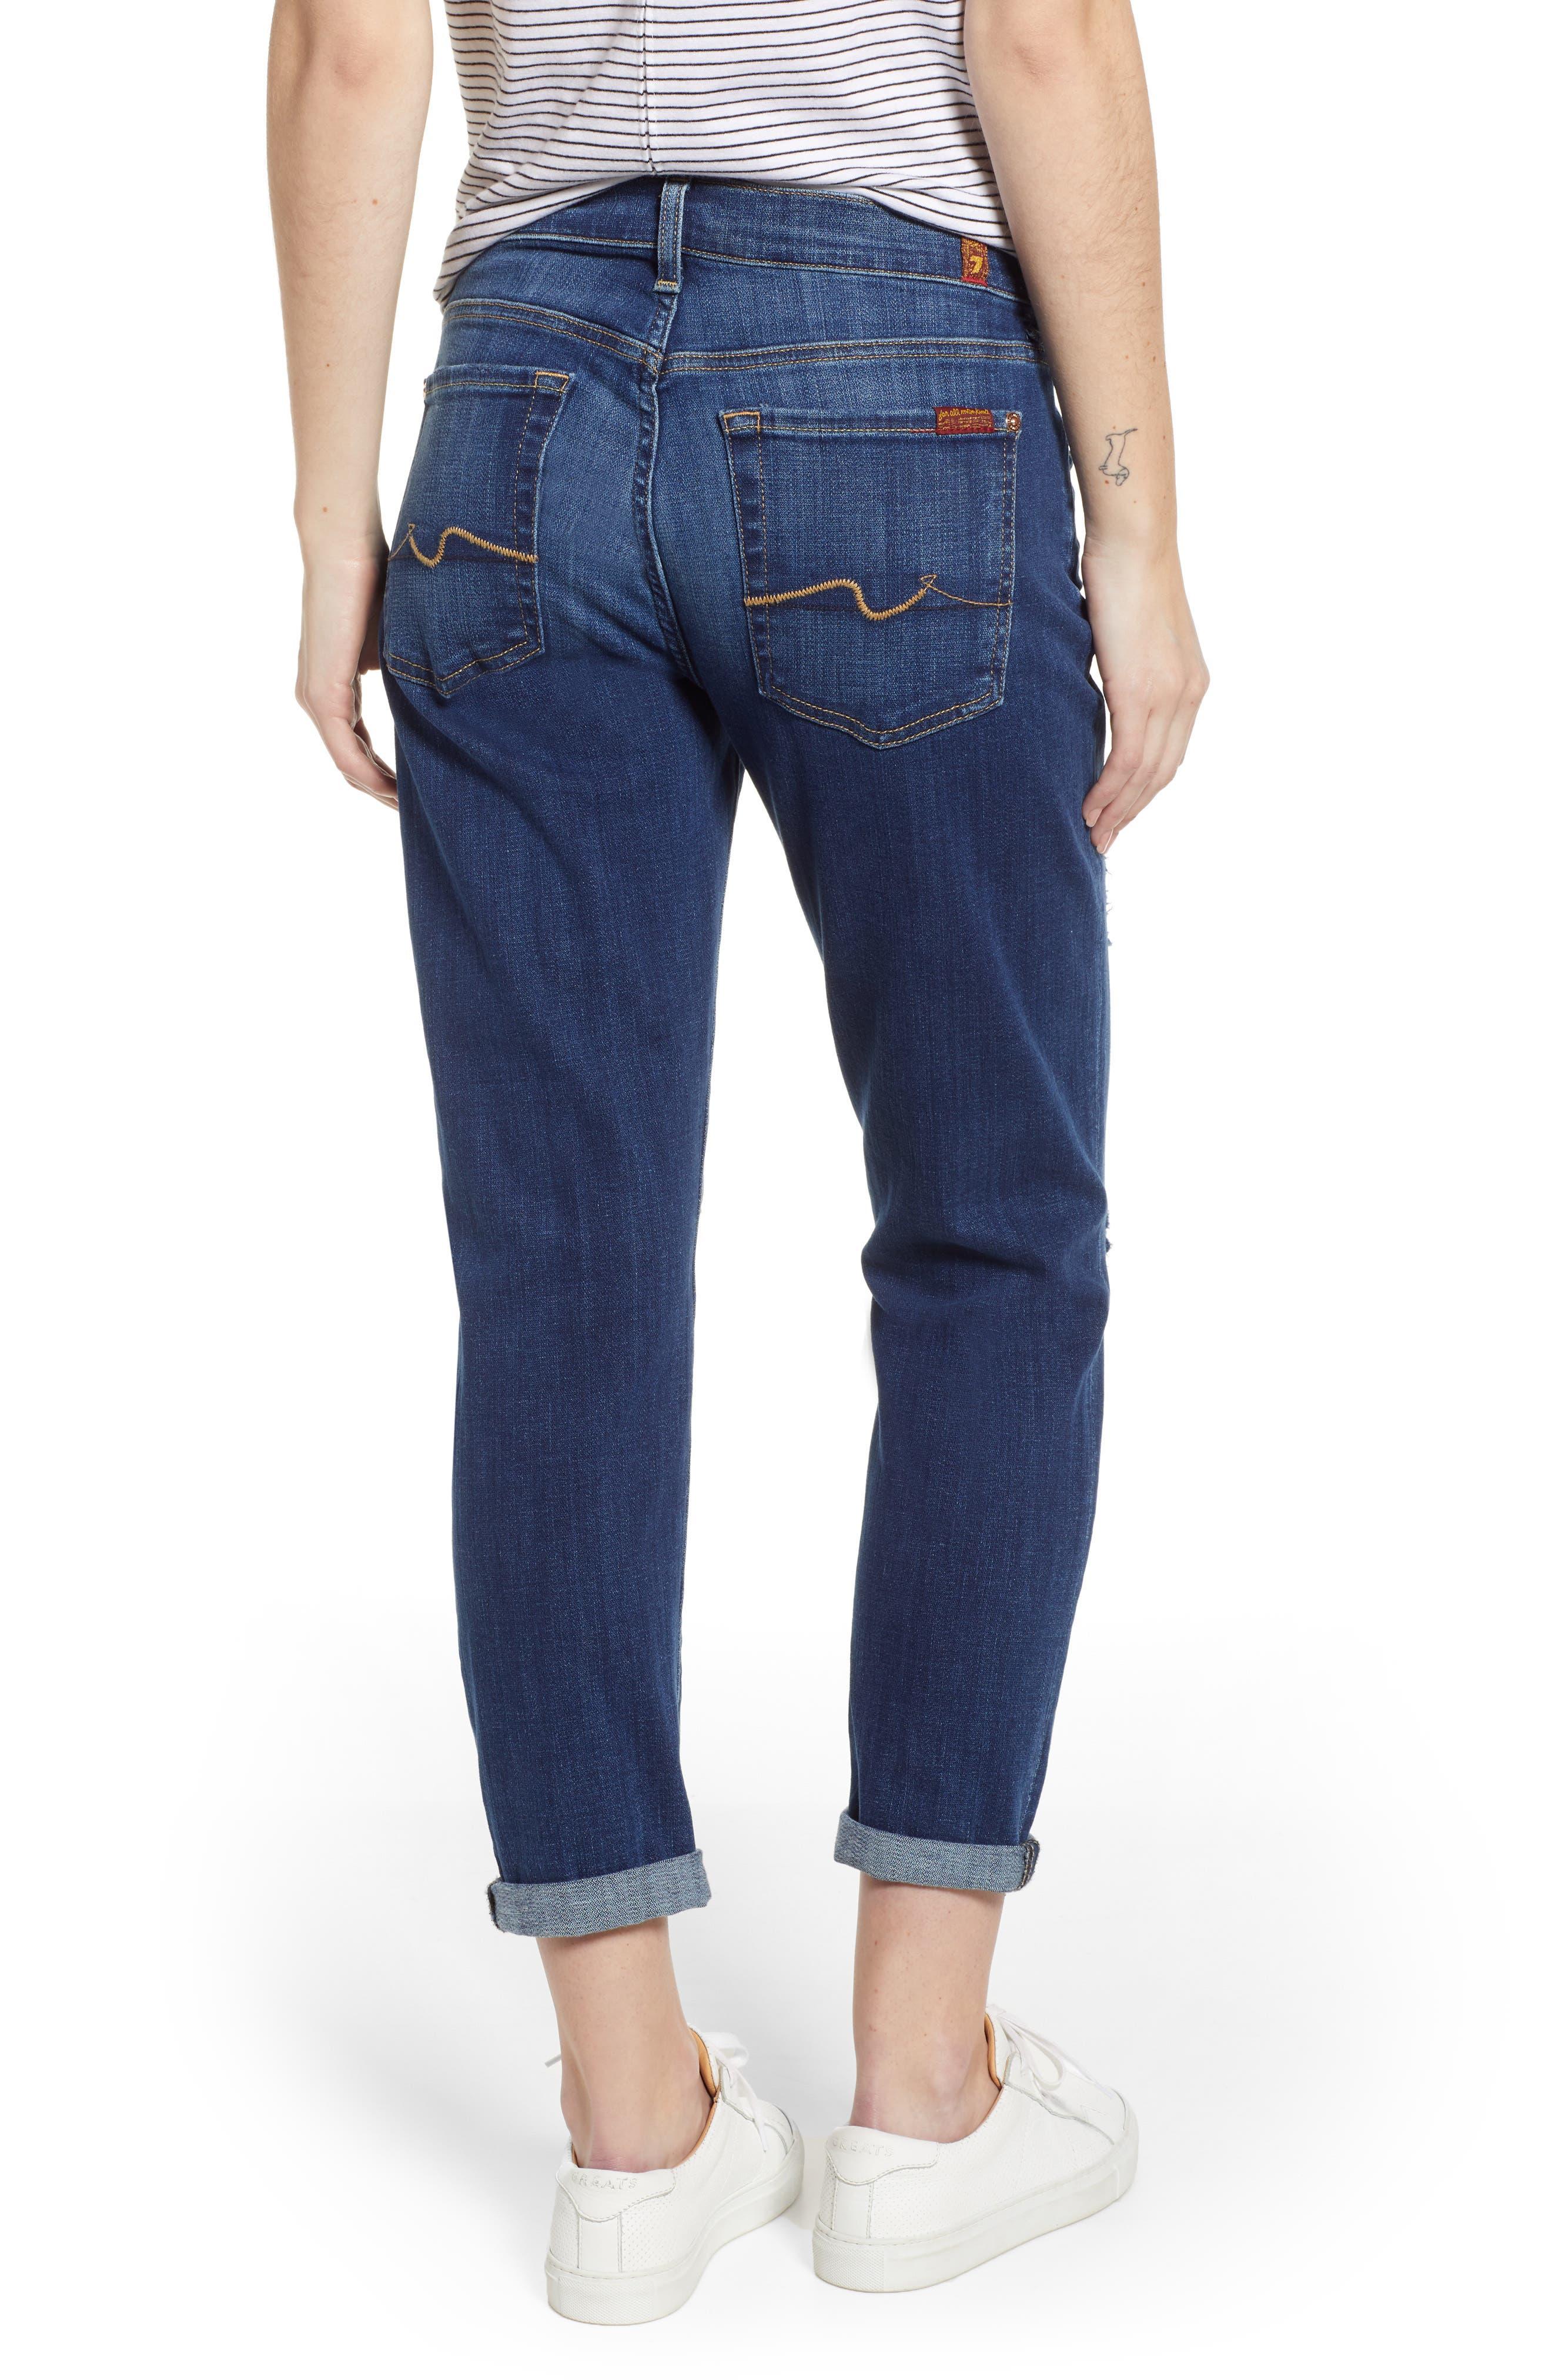 7 FOR ALL MANKIND<SUP>®</SUP>, Josefina Boyfriend Jeans, Alternate thumbnail 2, color, BROKEN TWILL VANITY W/ DESTROY